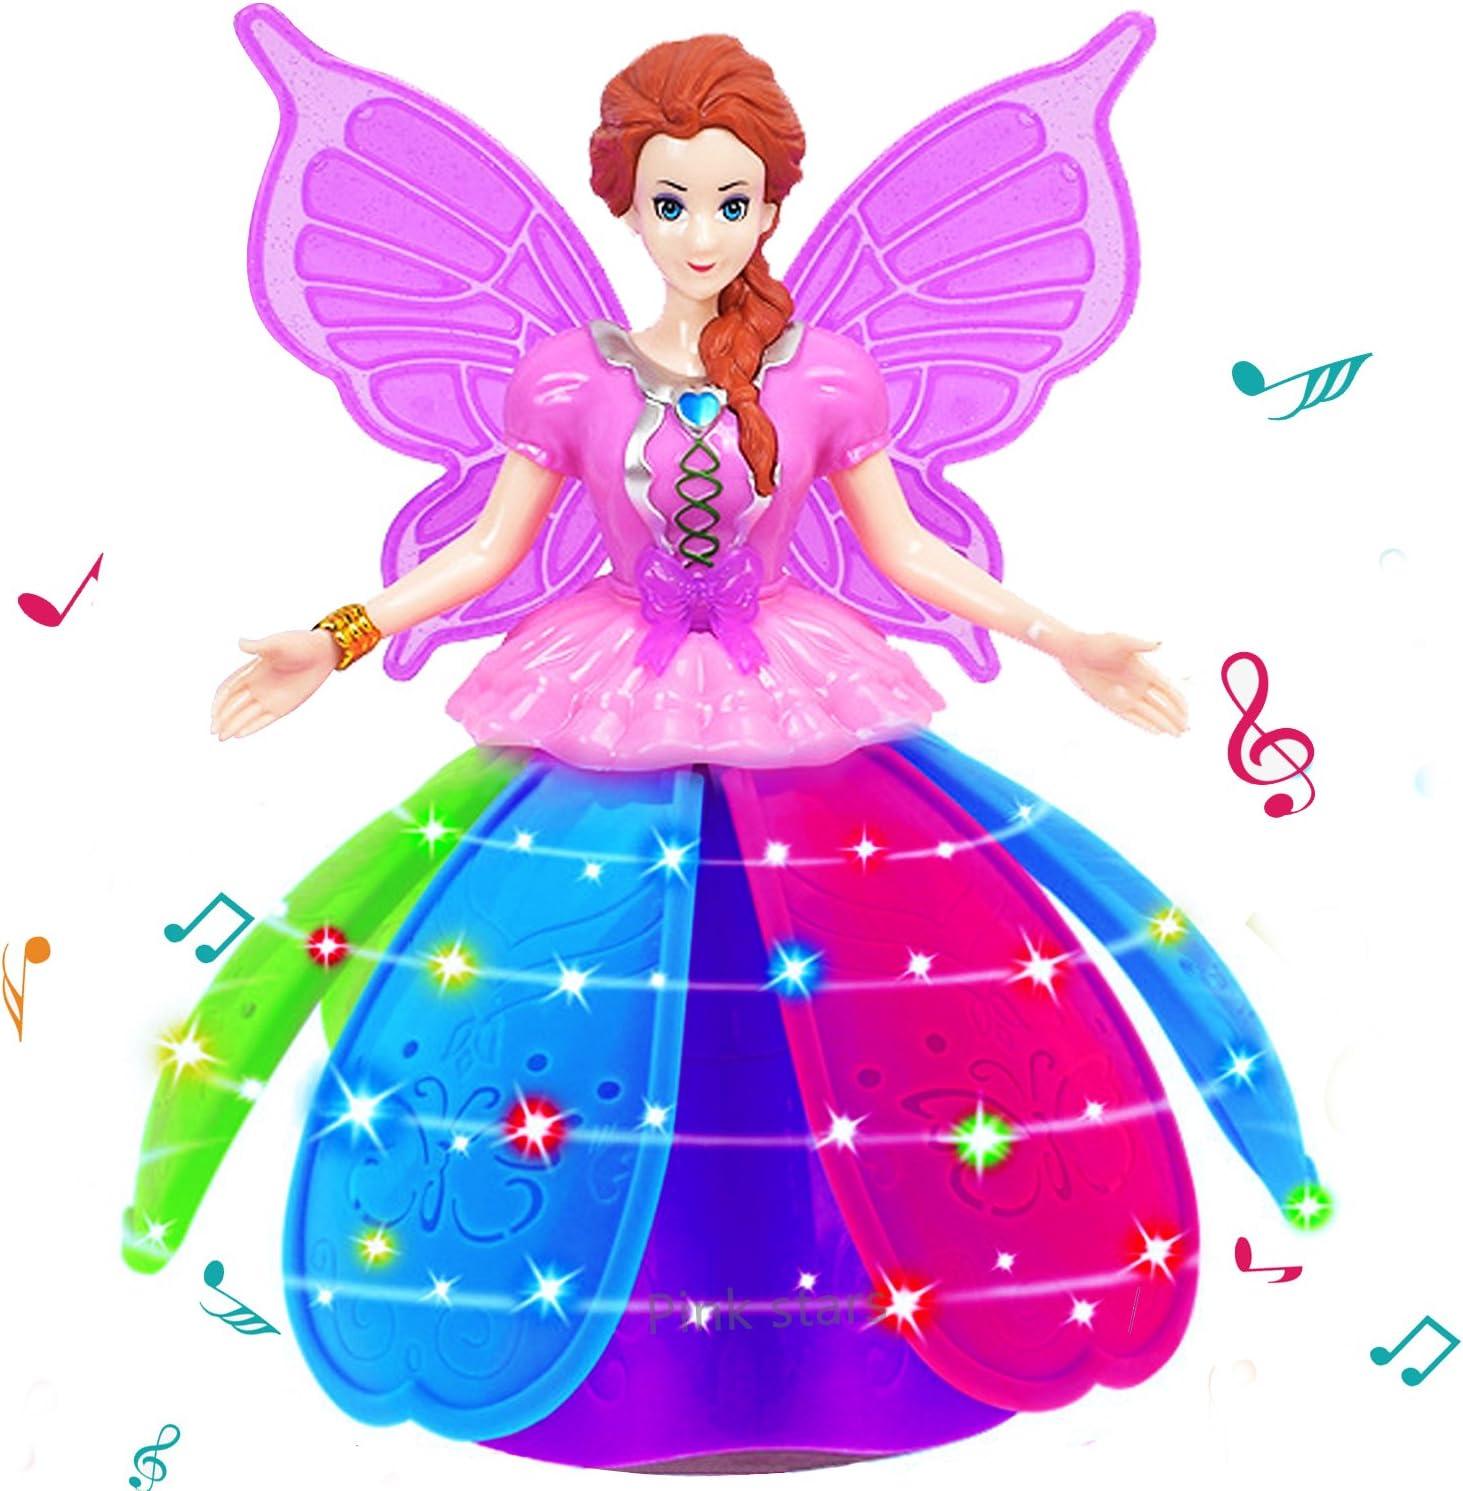 Princess Flying Elsa Fairy Magical Princess Girls Doll Xmas Gift Interactive Toy